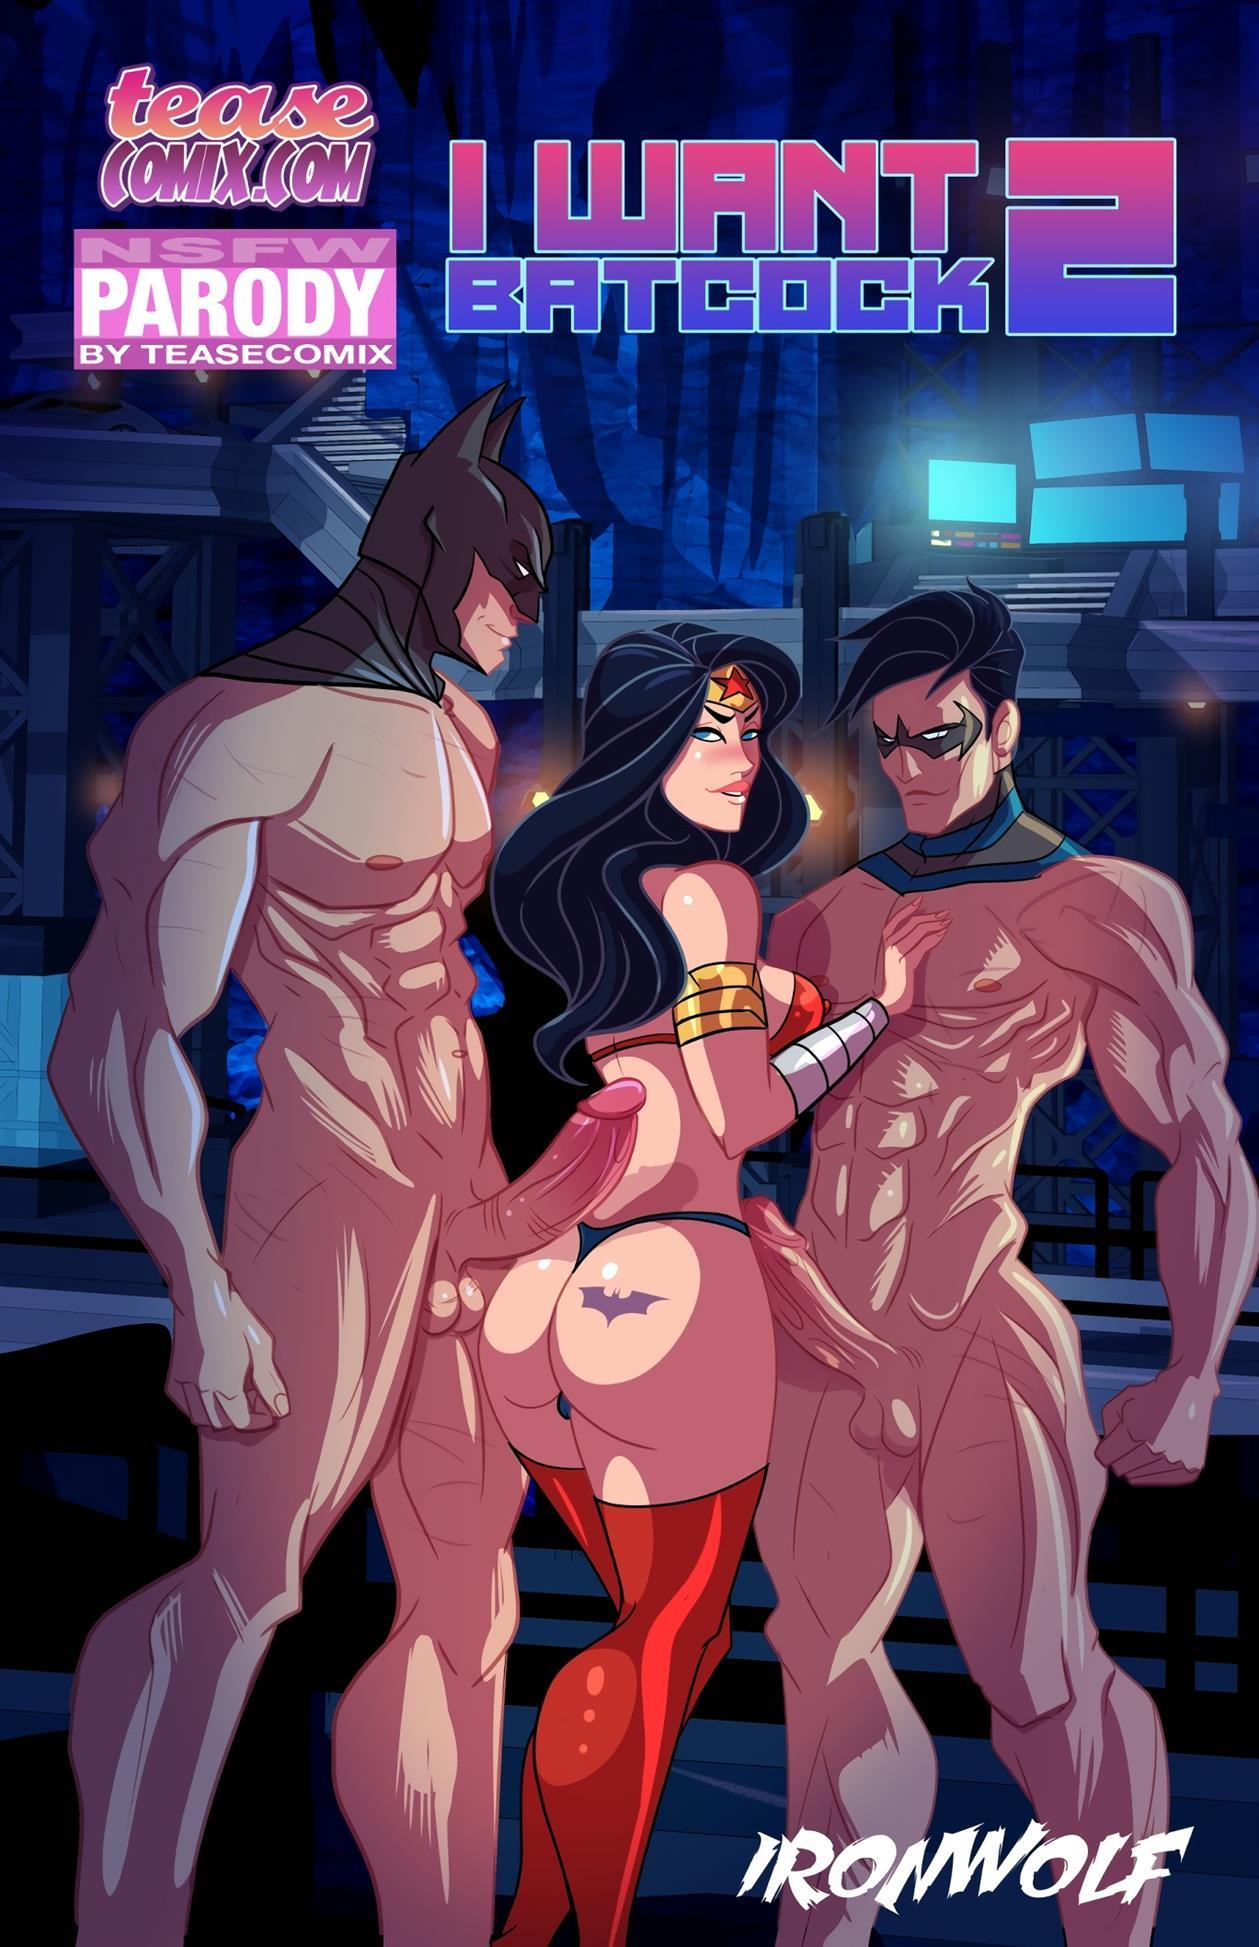 I Want Batcock 2 (Batman) [Tease Comix]